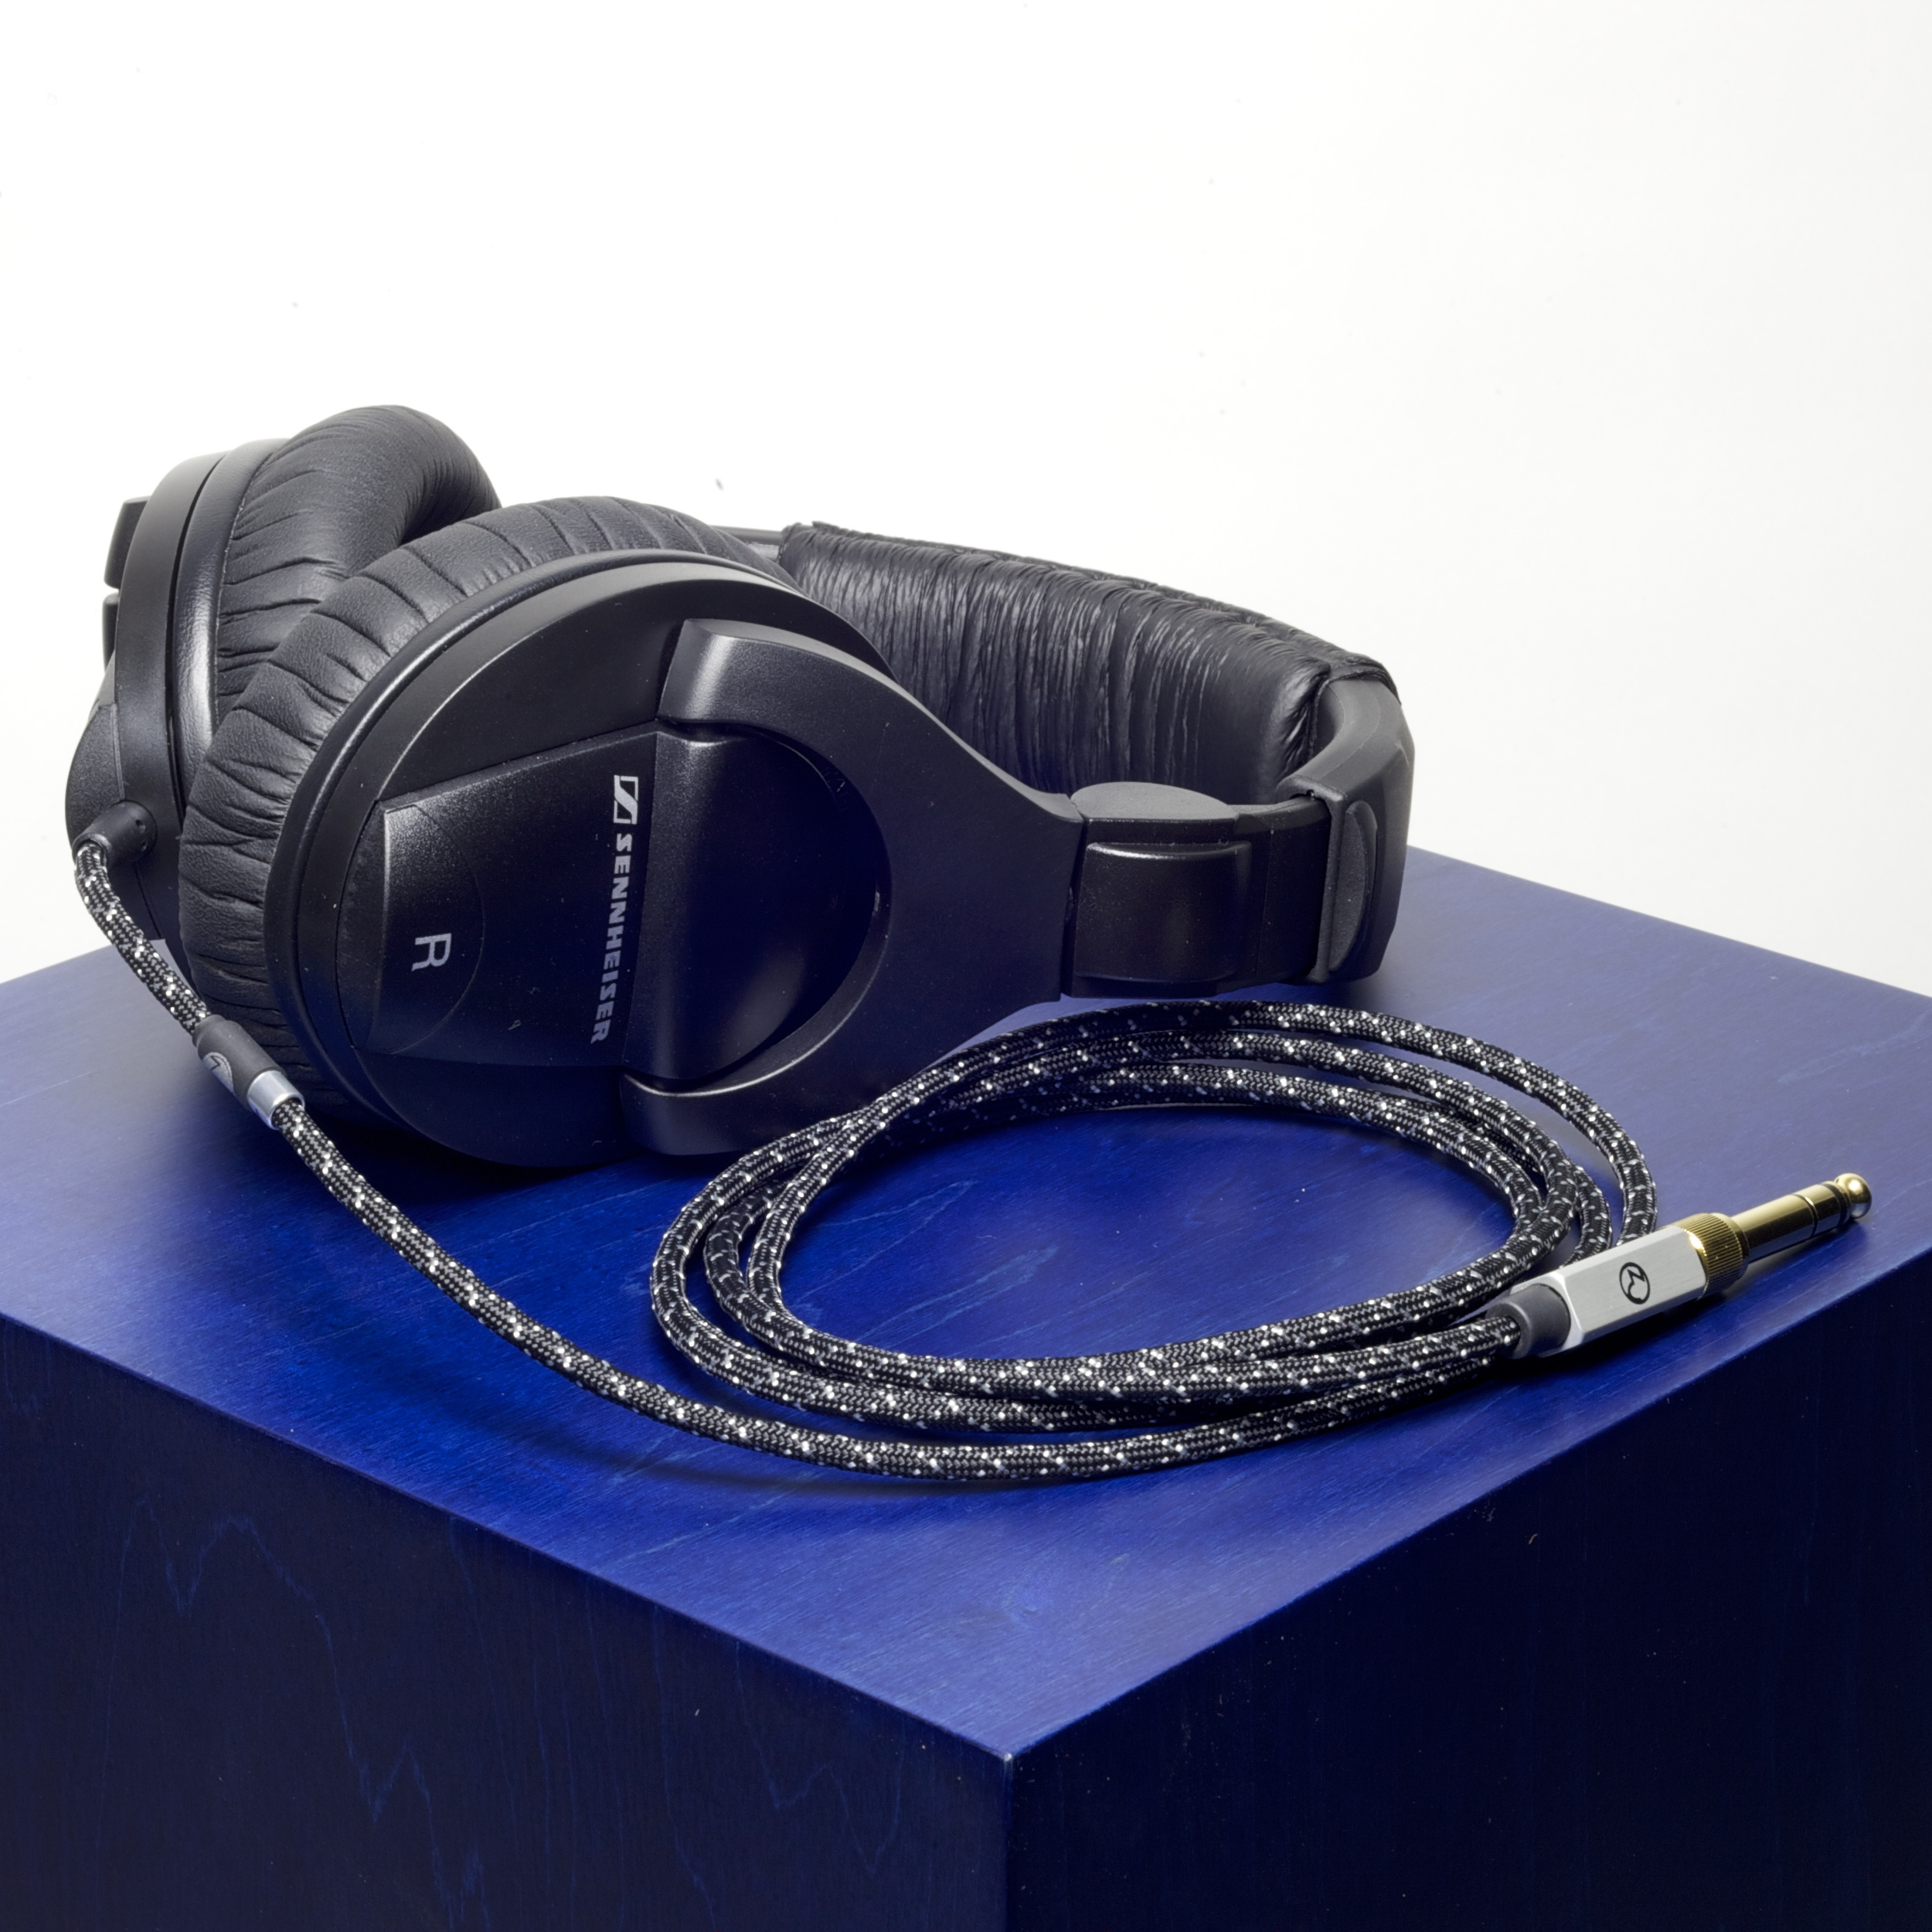 Sennheiser 280 + Mobius Cable